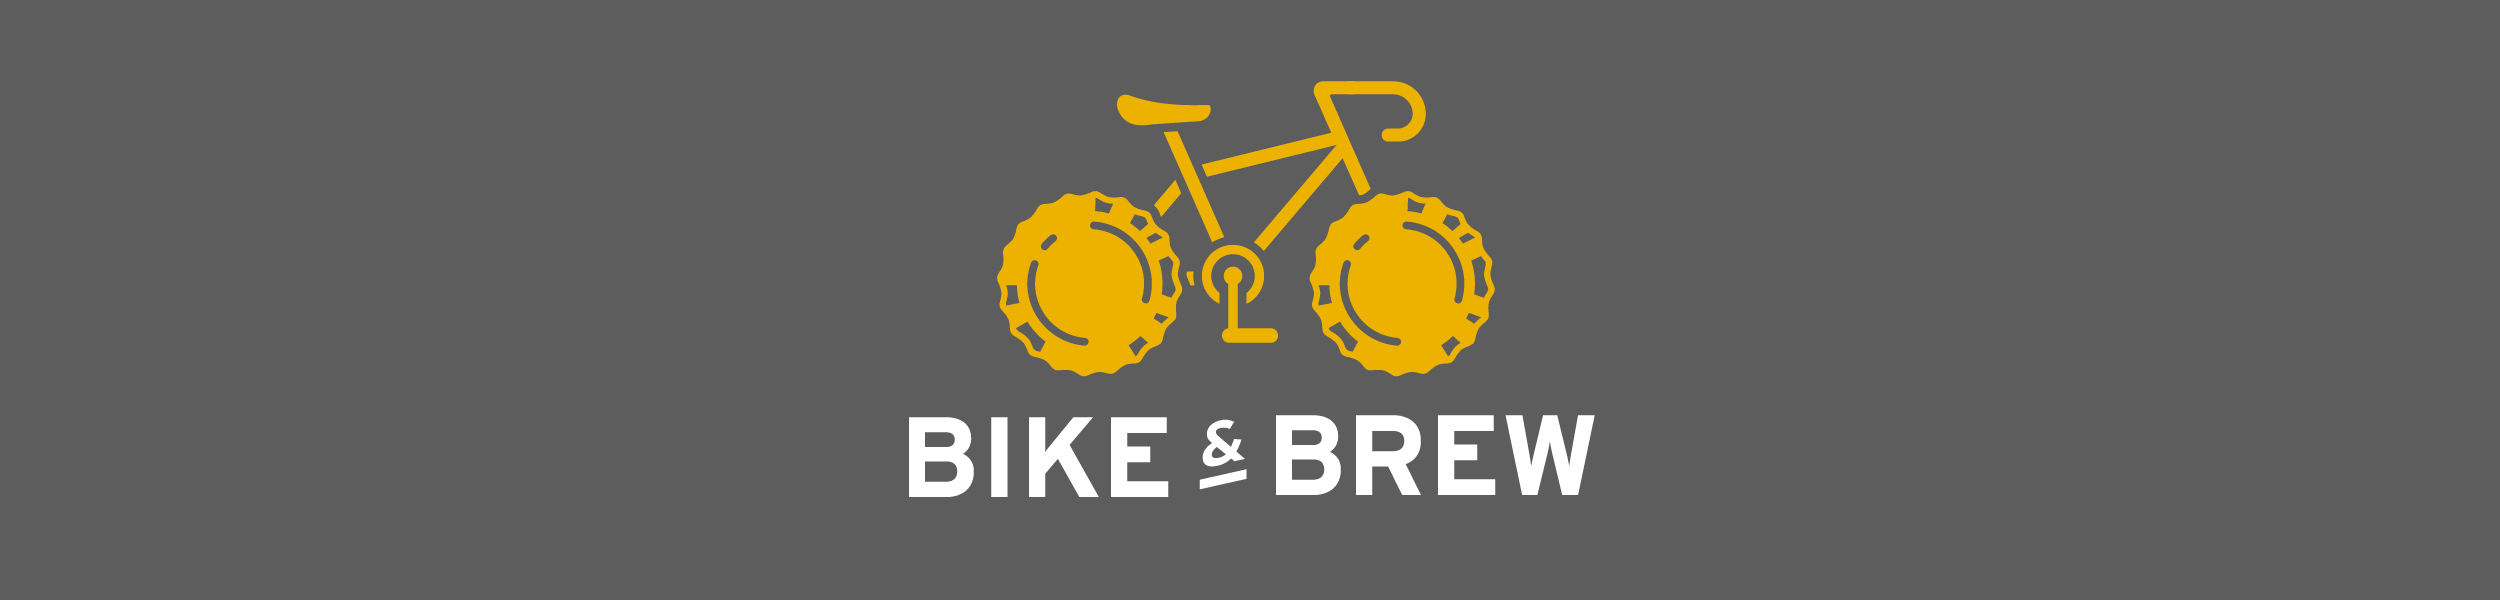 Bike and Brew Final Logo.jpg